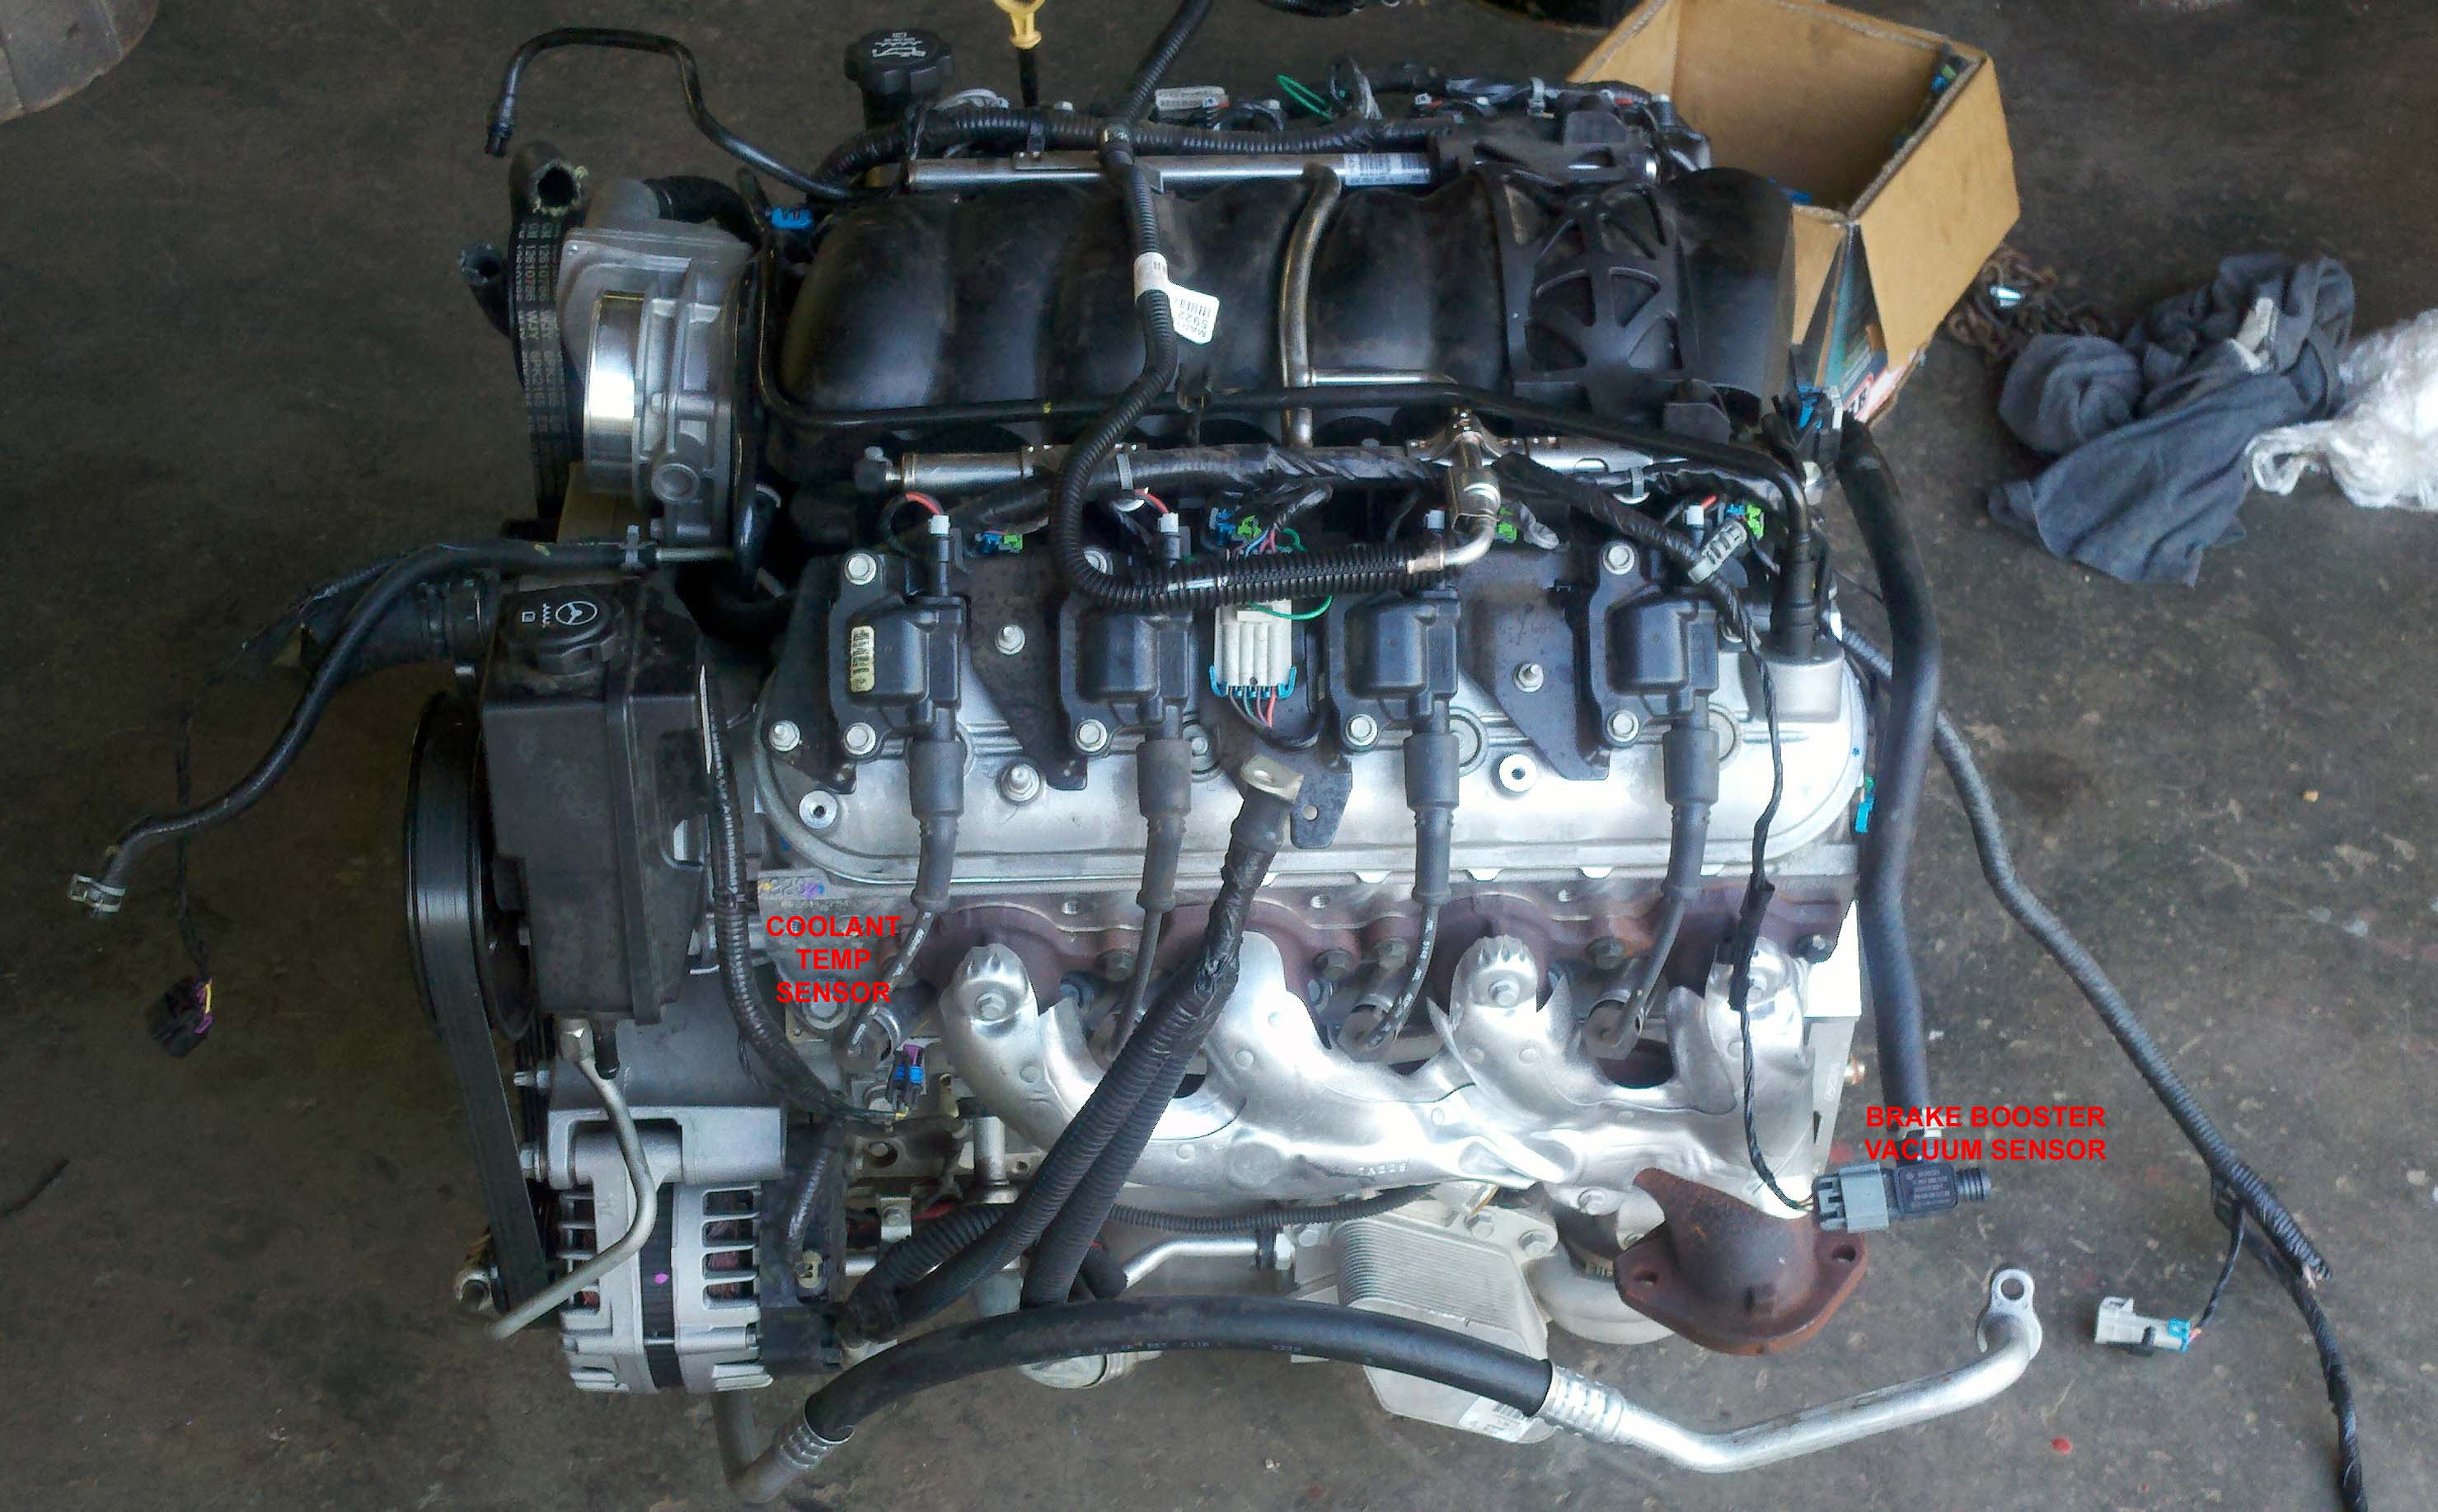 2010 to 2011 camaro ls3, l99 6.2l information  lt1 swap